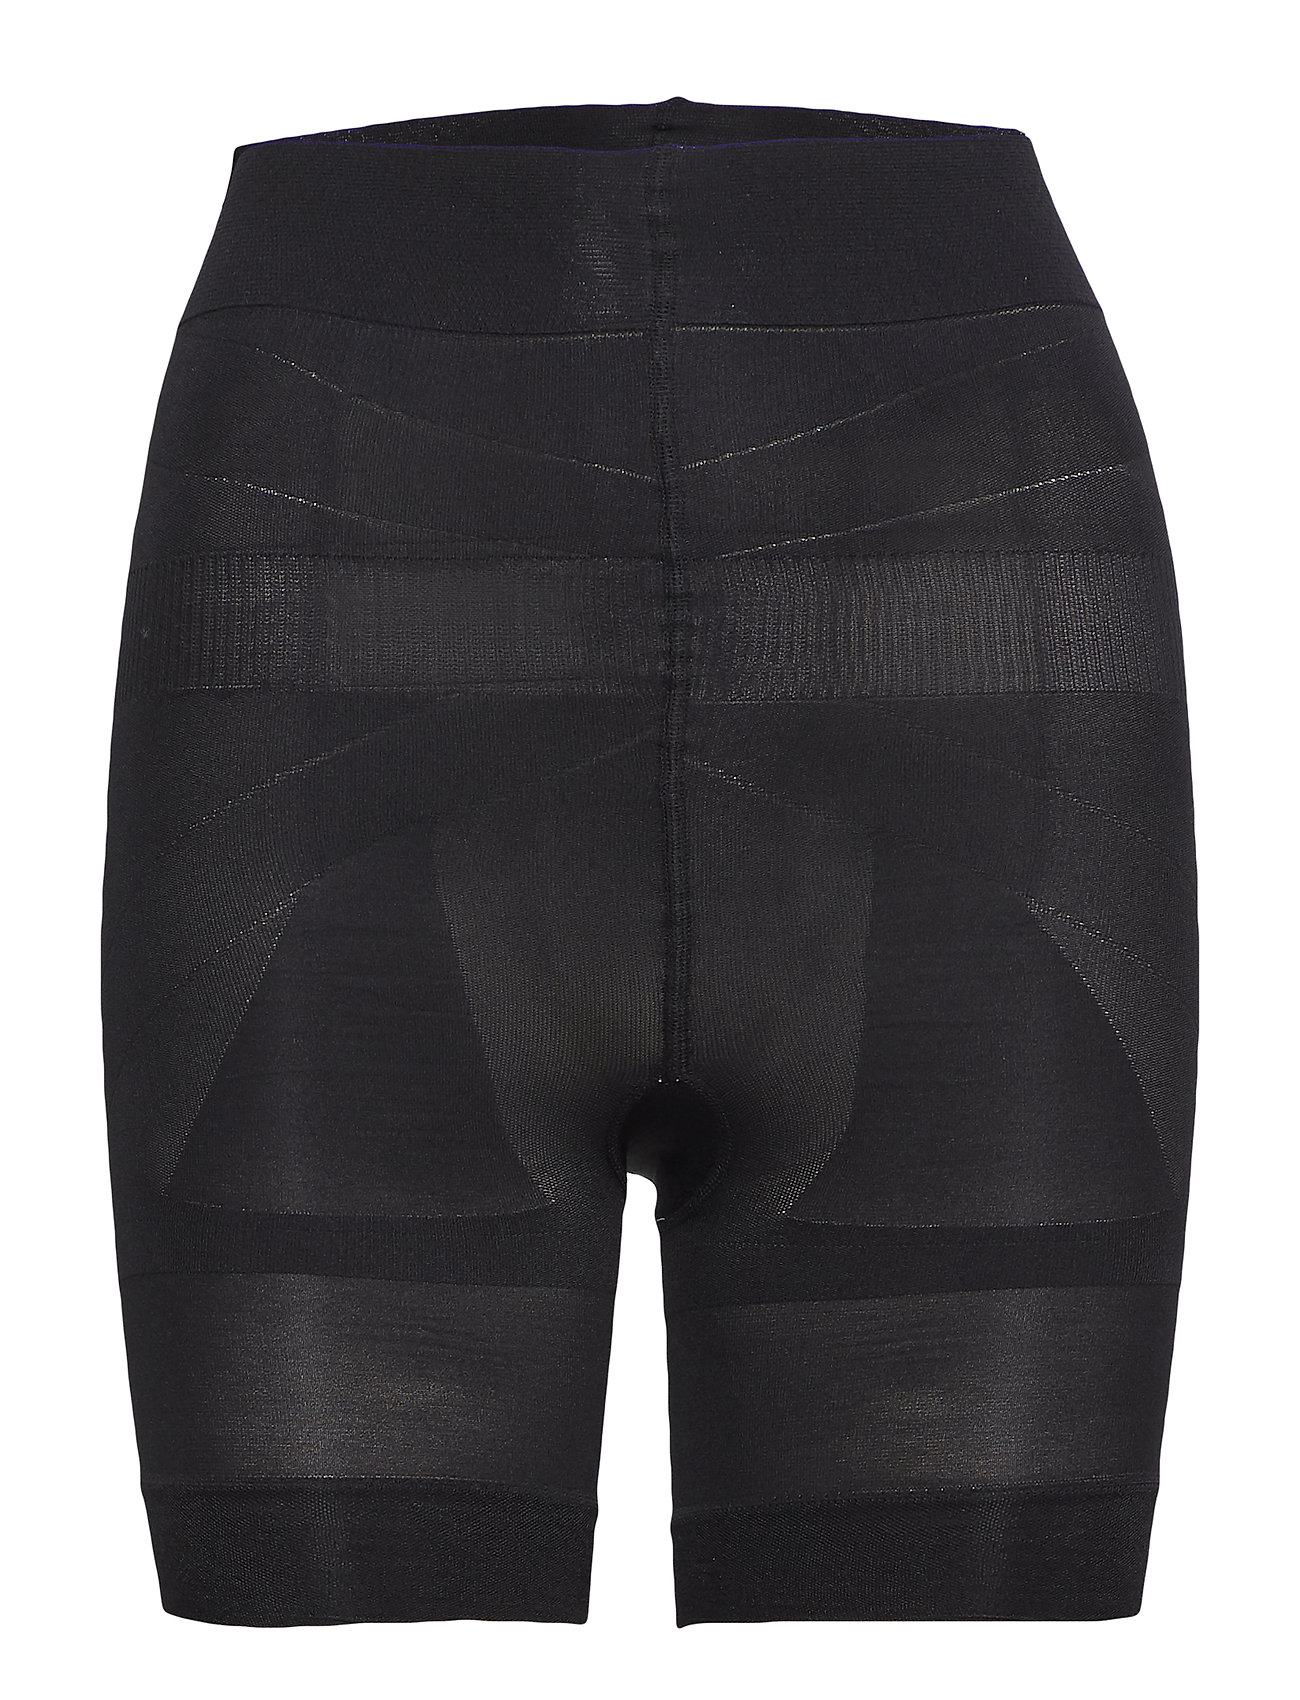 Swedish Stockings Julia shaping shorts Shapewear